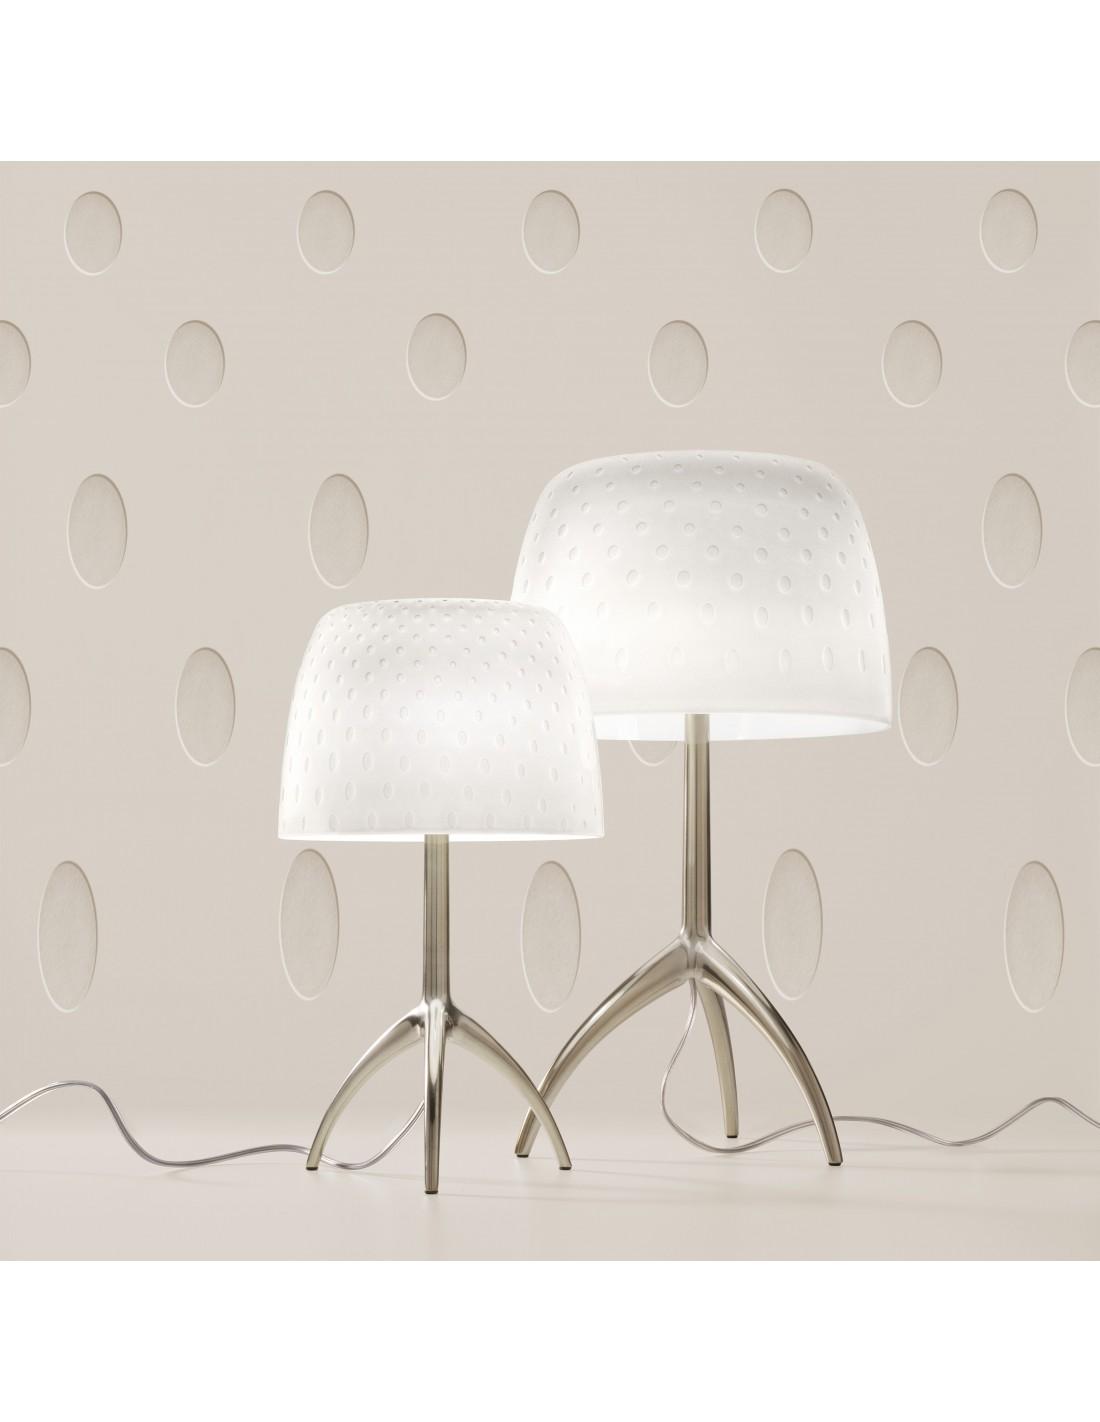 Lampe de table Lumière 30th bulles Piccola et Grande Foscarini Valente Design